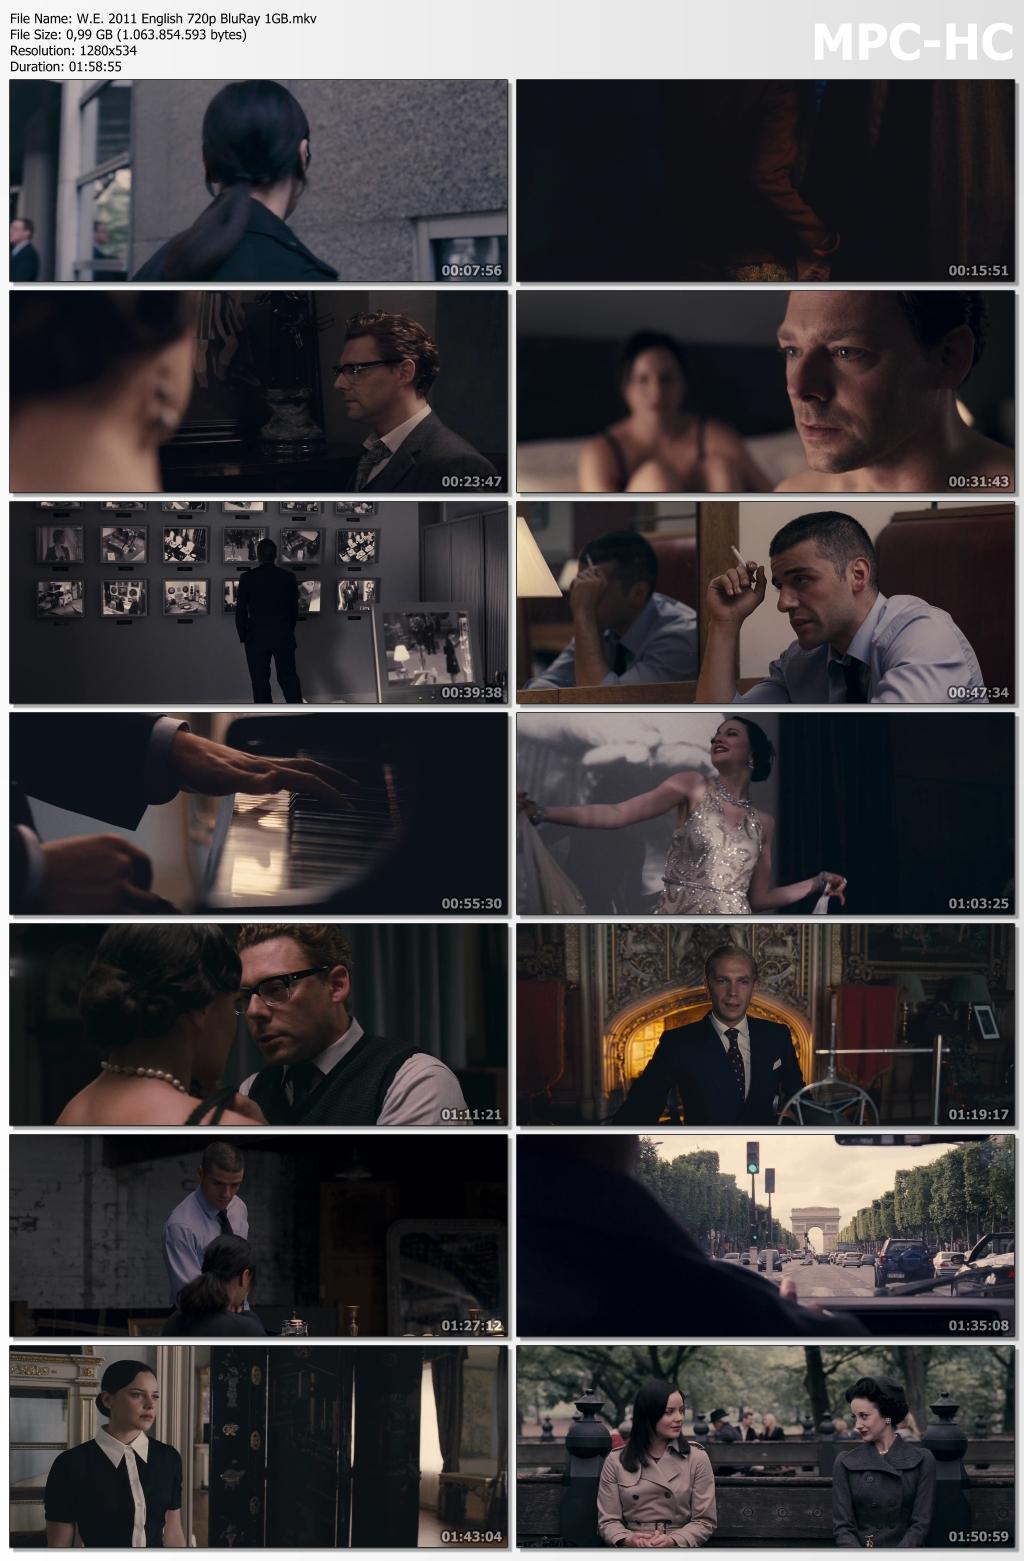 W.E. 2011 English 720p BluRay 1GB